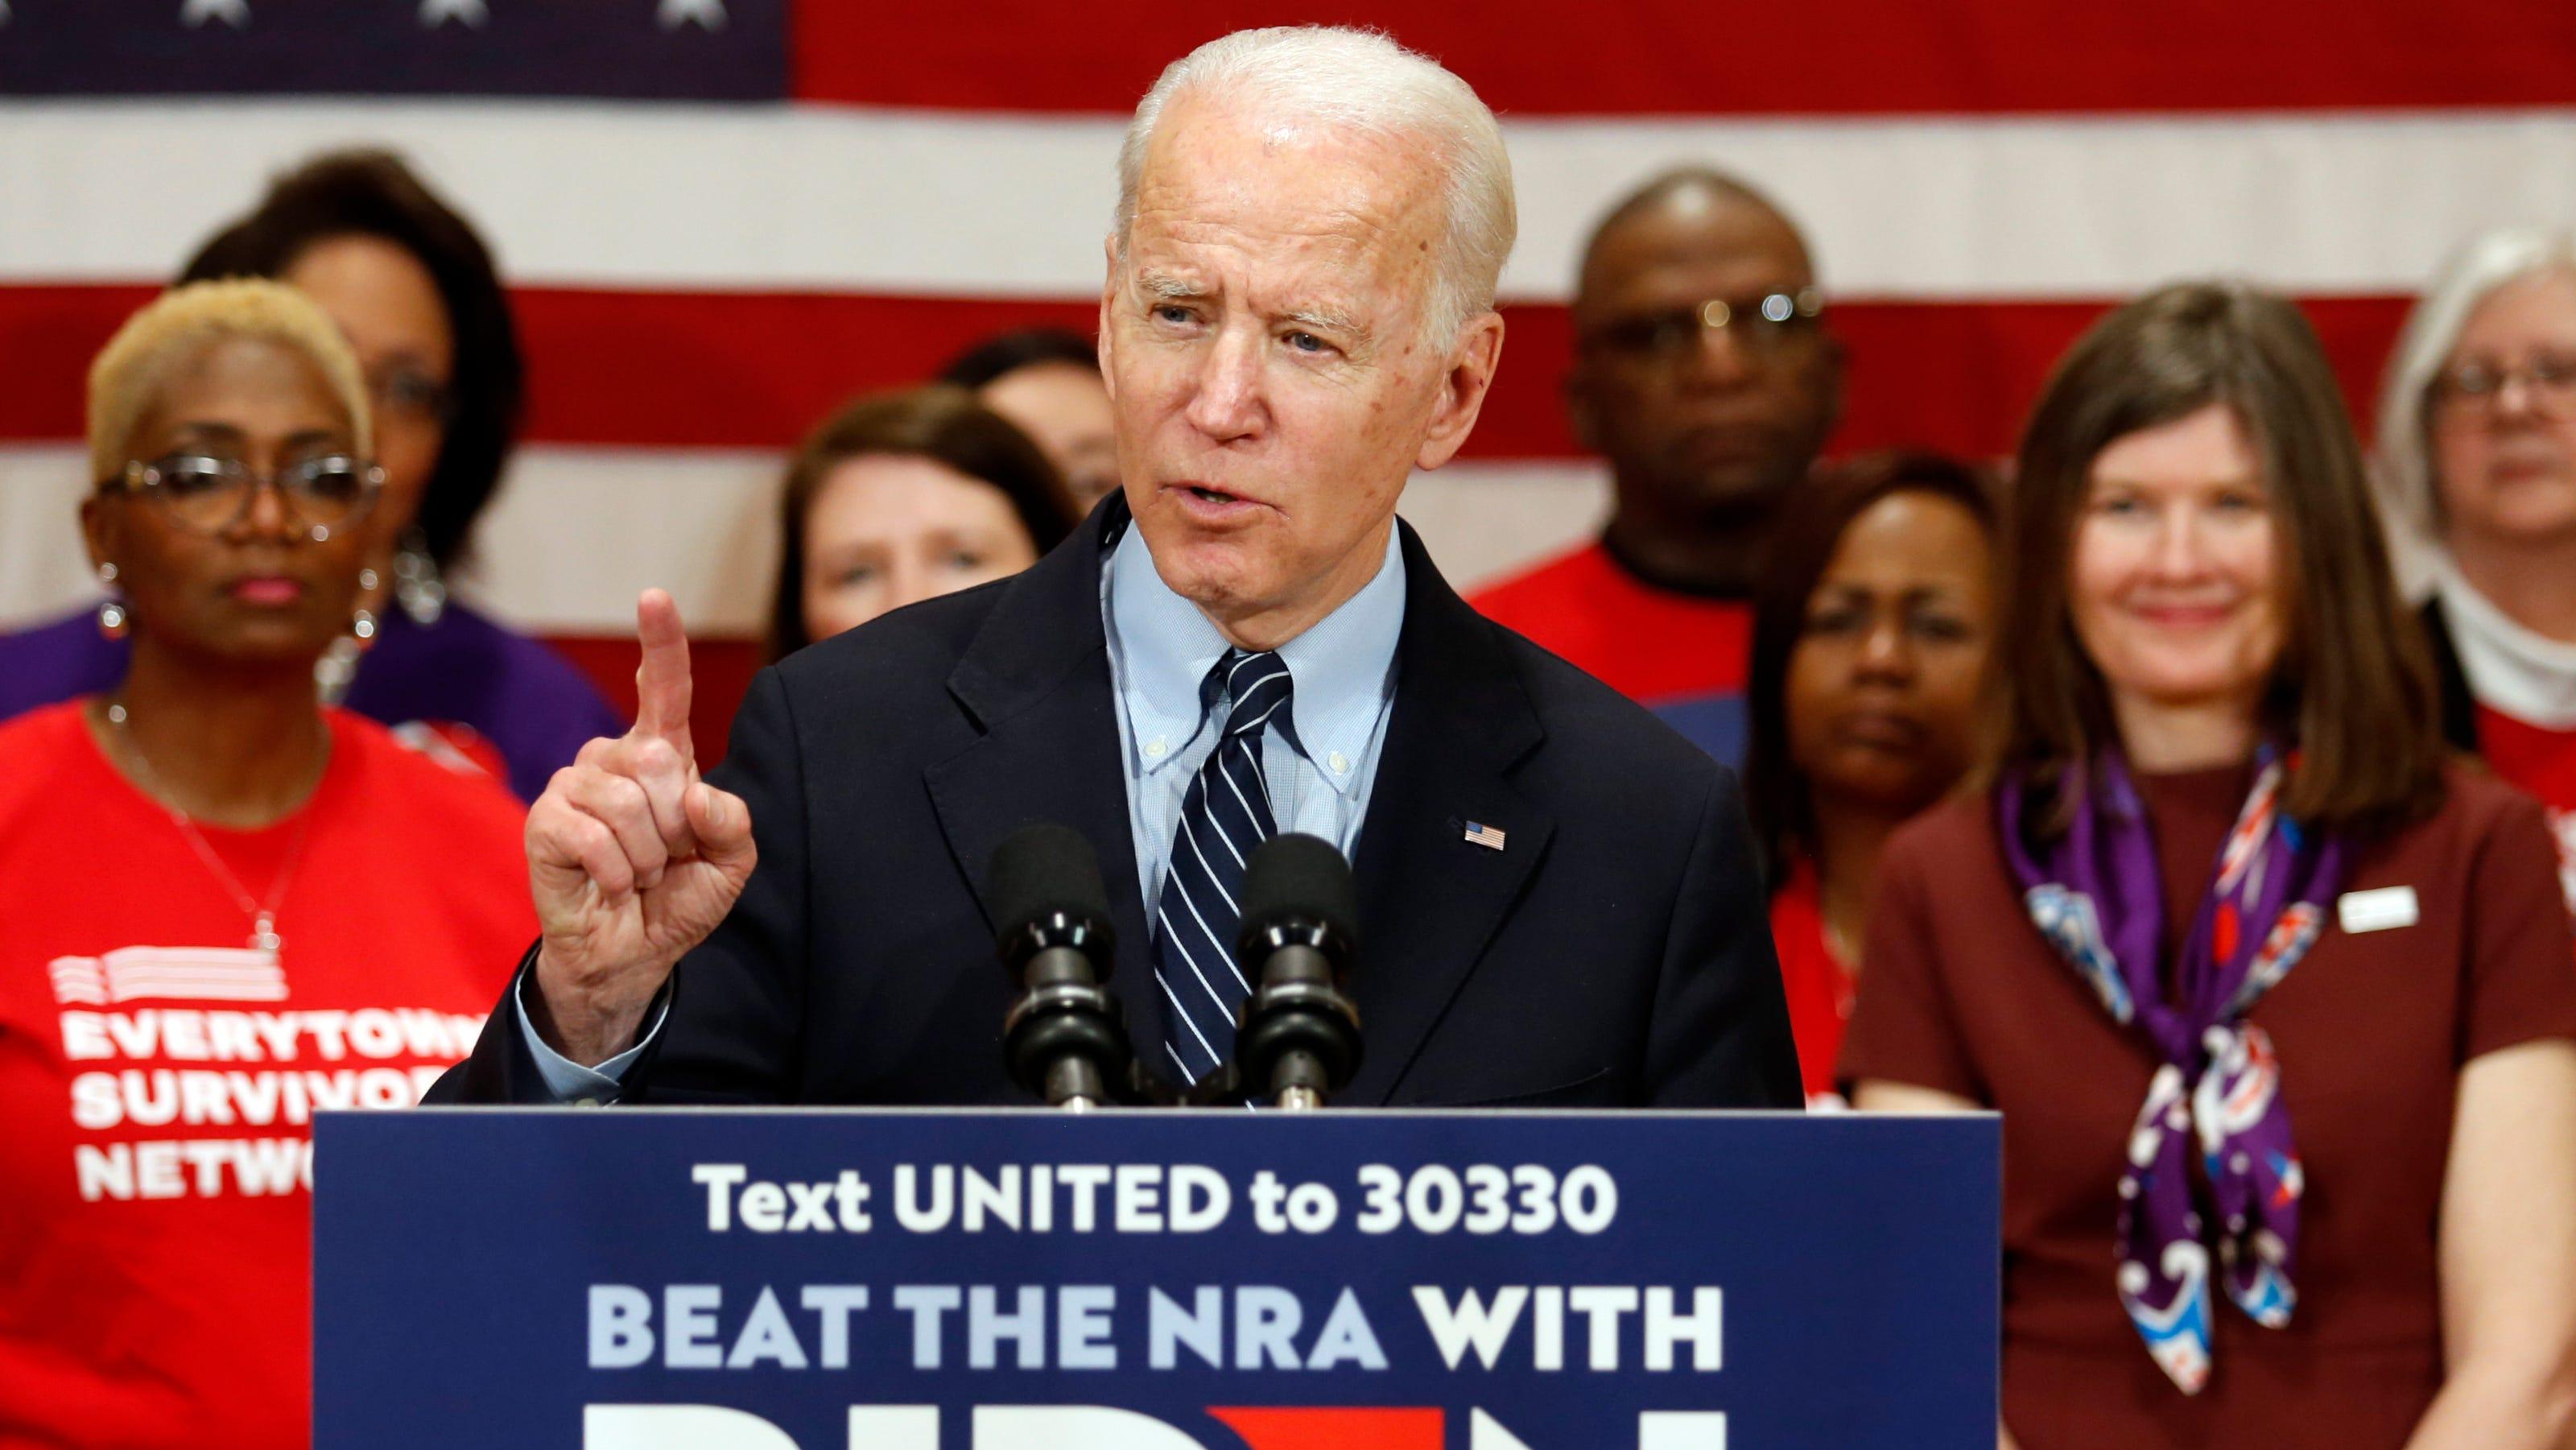 Opinion: Biden's health care plan abandons older Americans